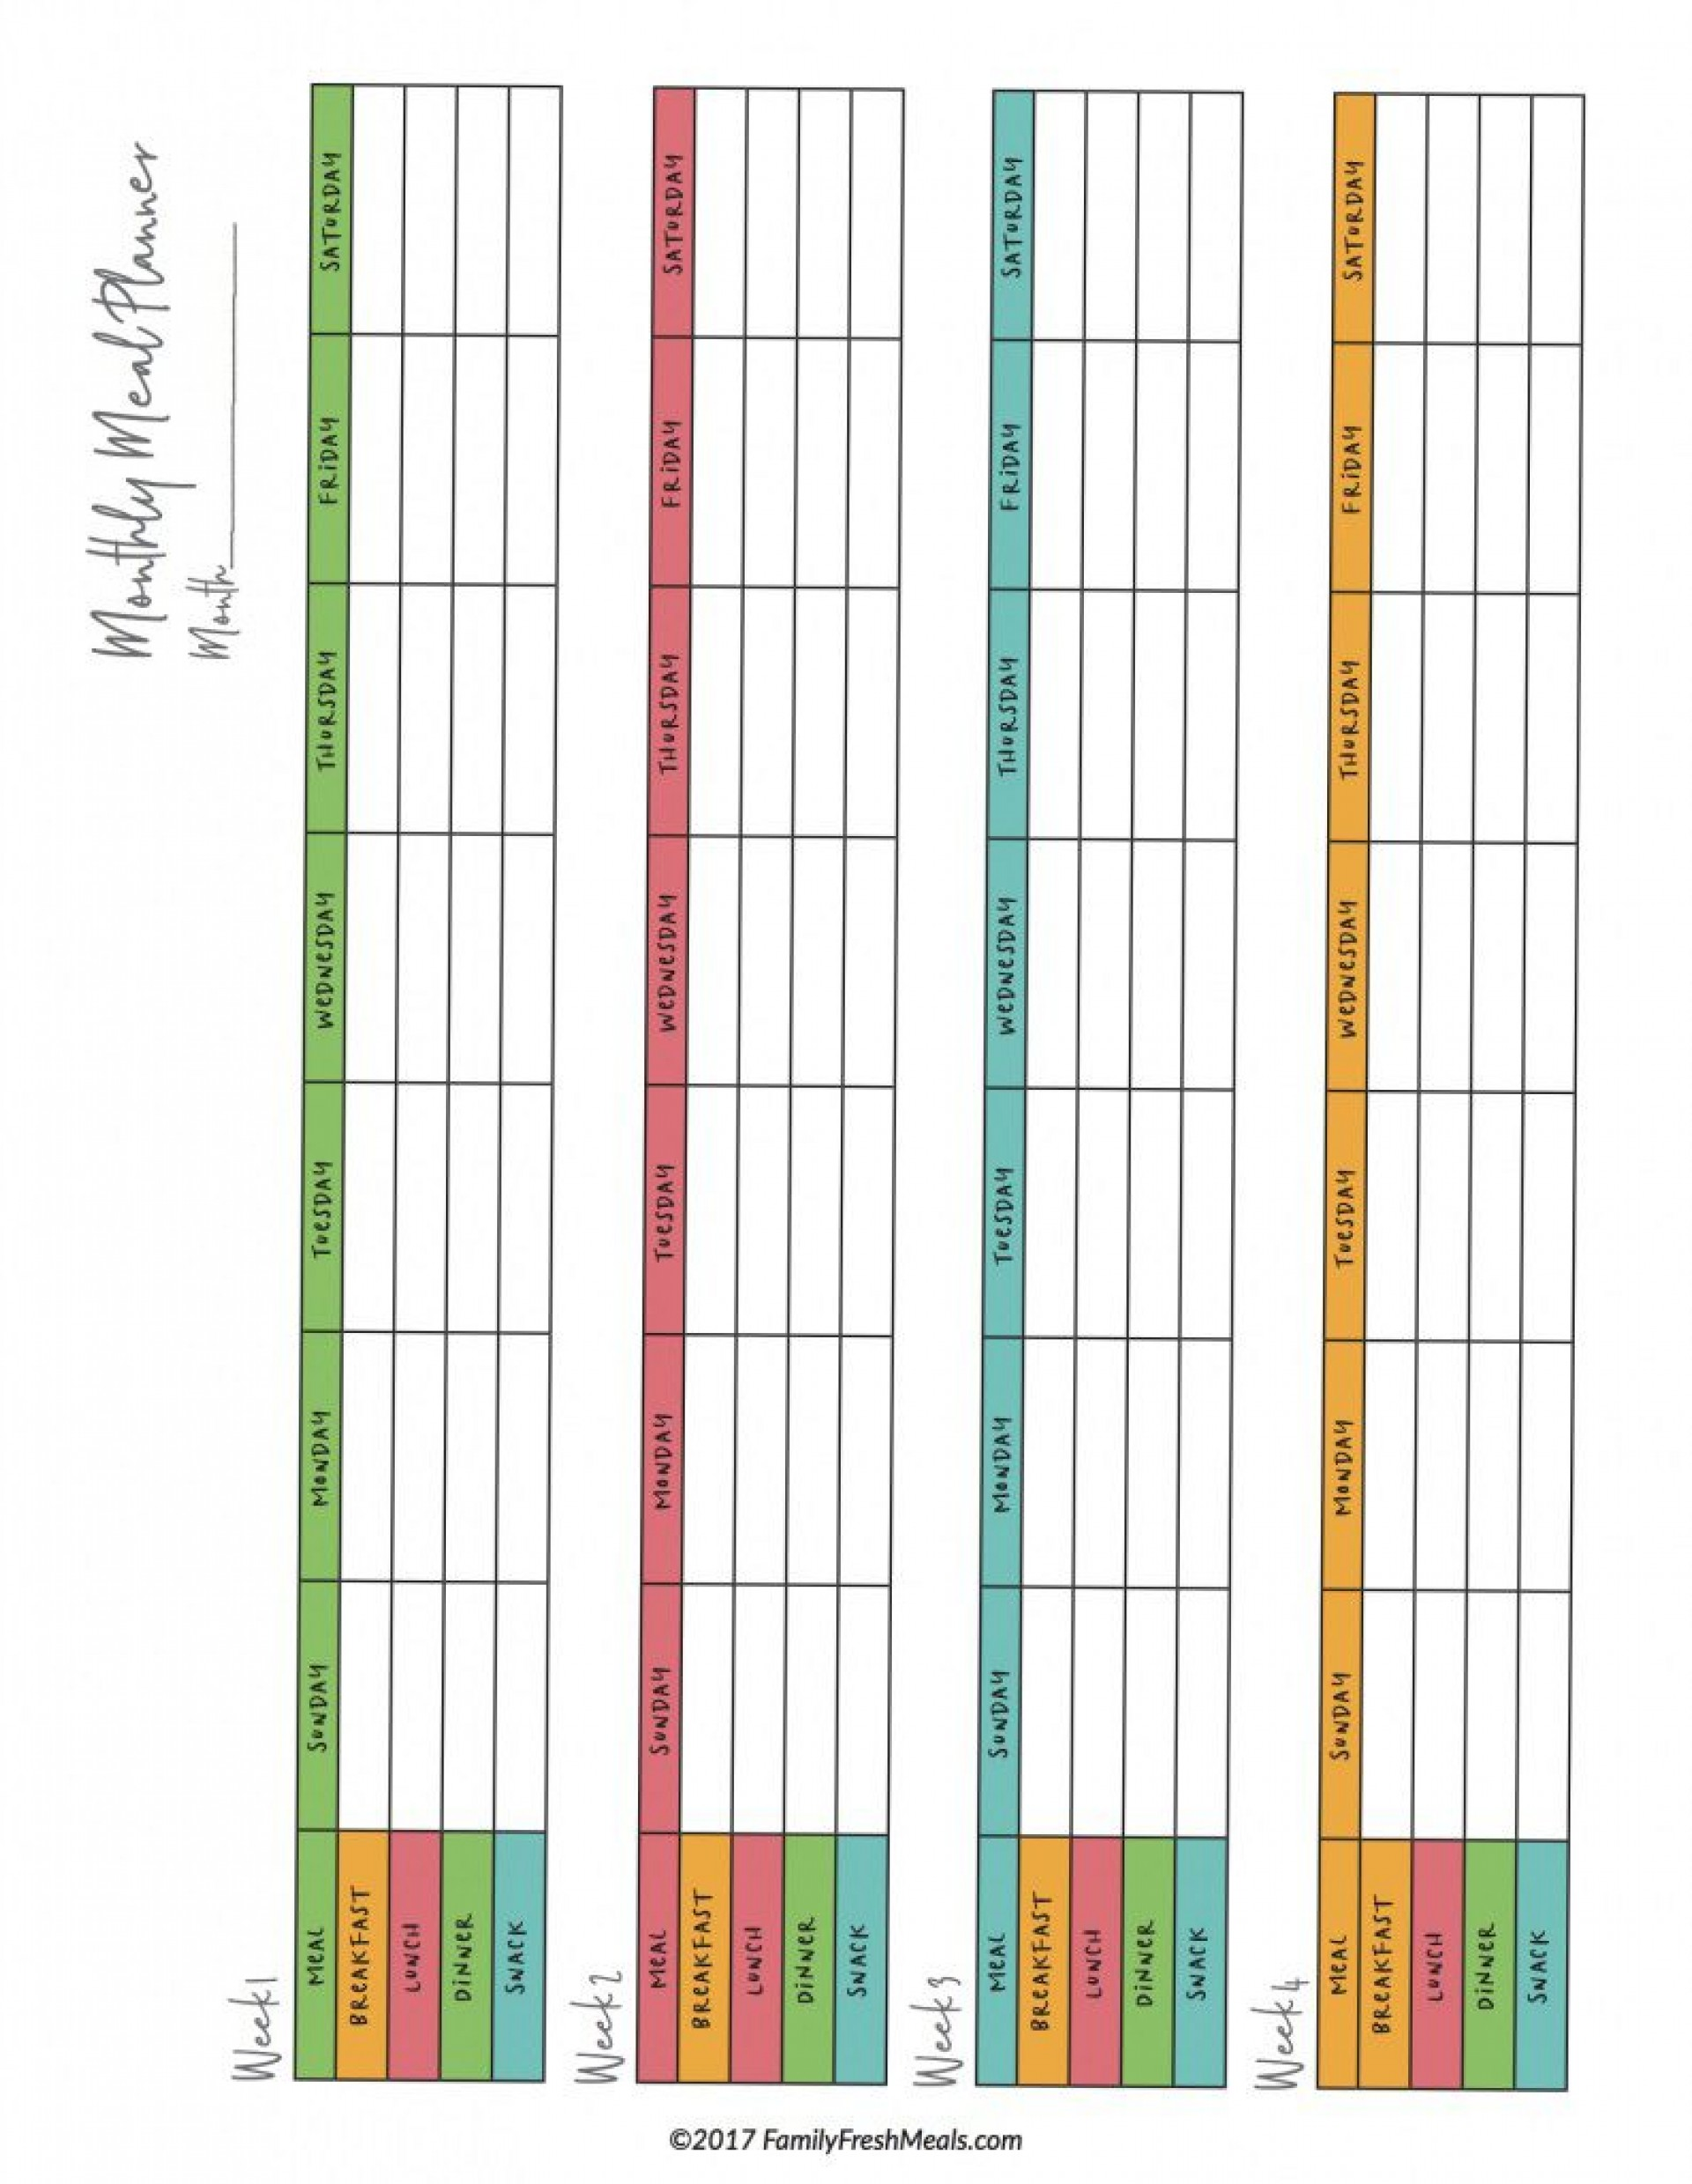 007 Staggering Meal Plan Printable Pdf Idea  Worksheet Downloadable Template Sheet1920